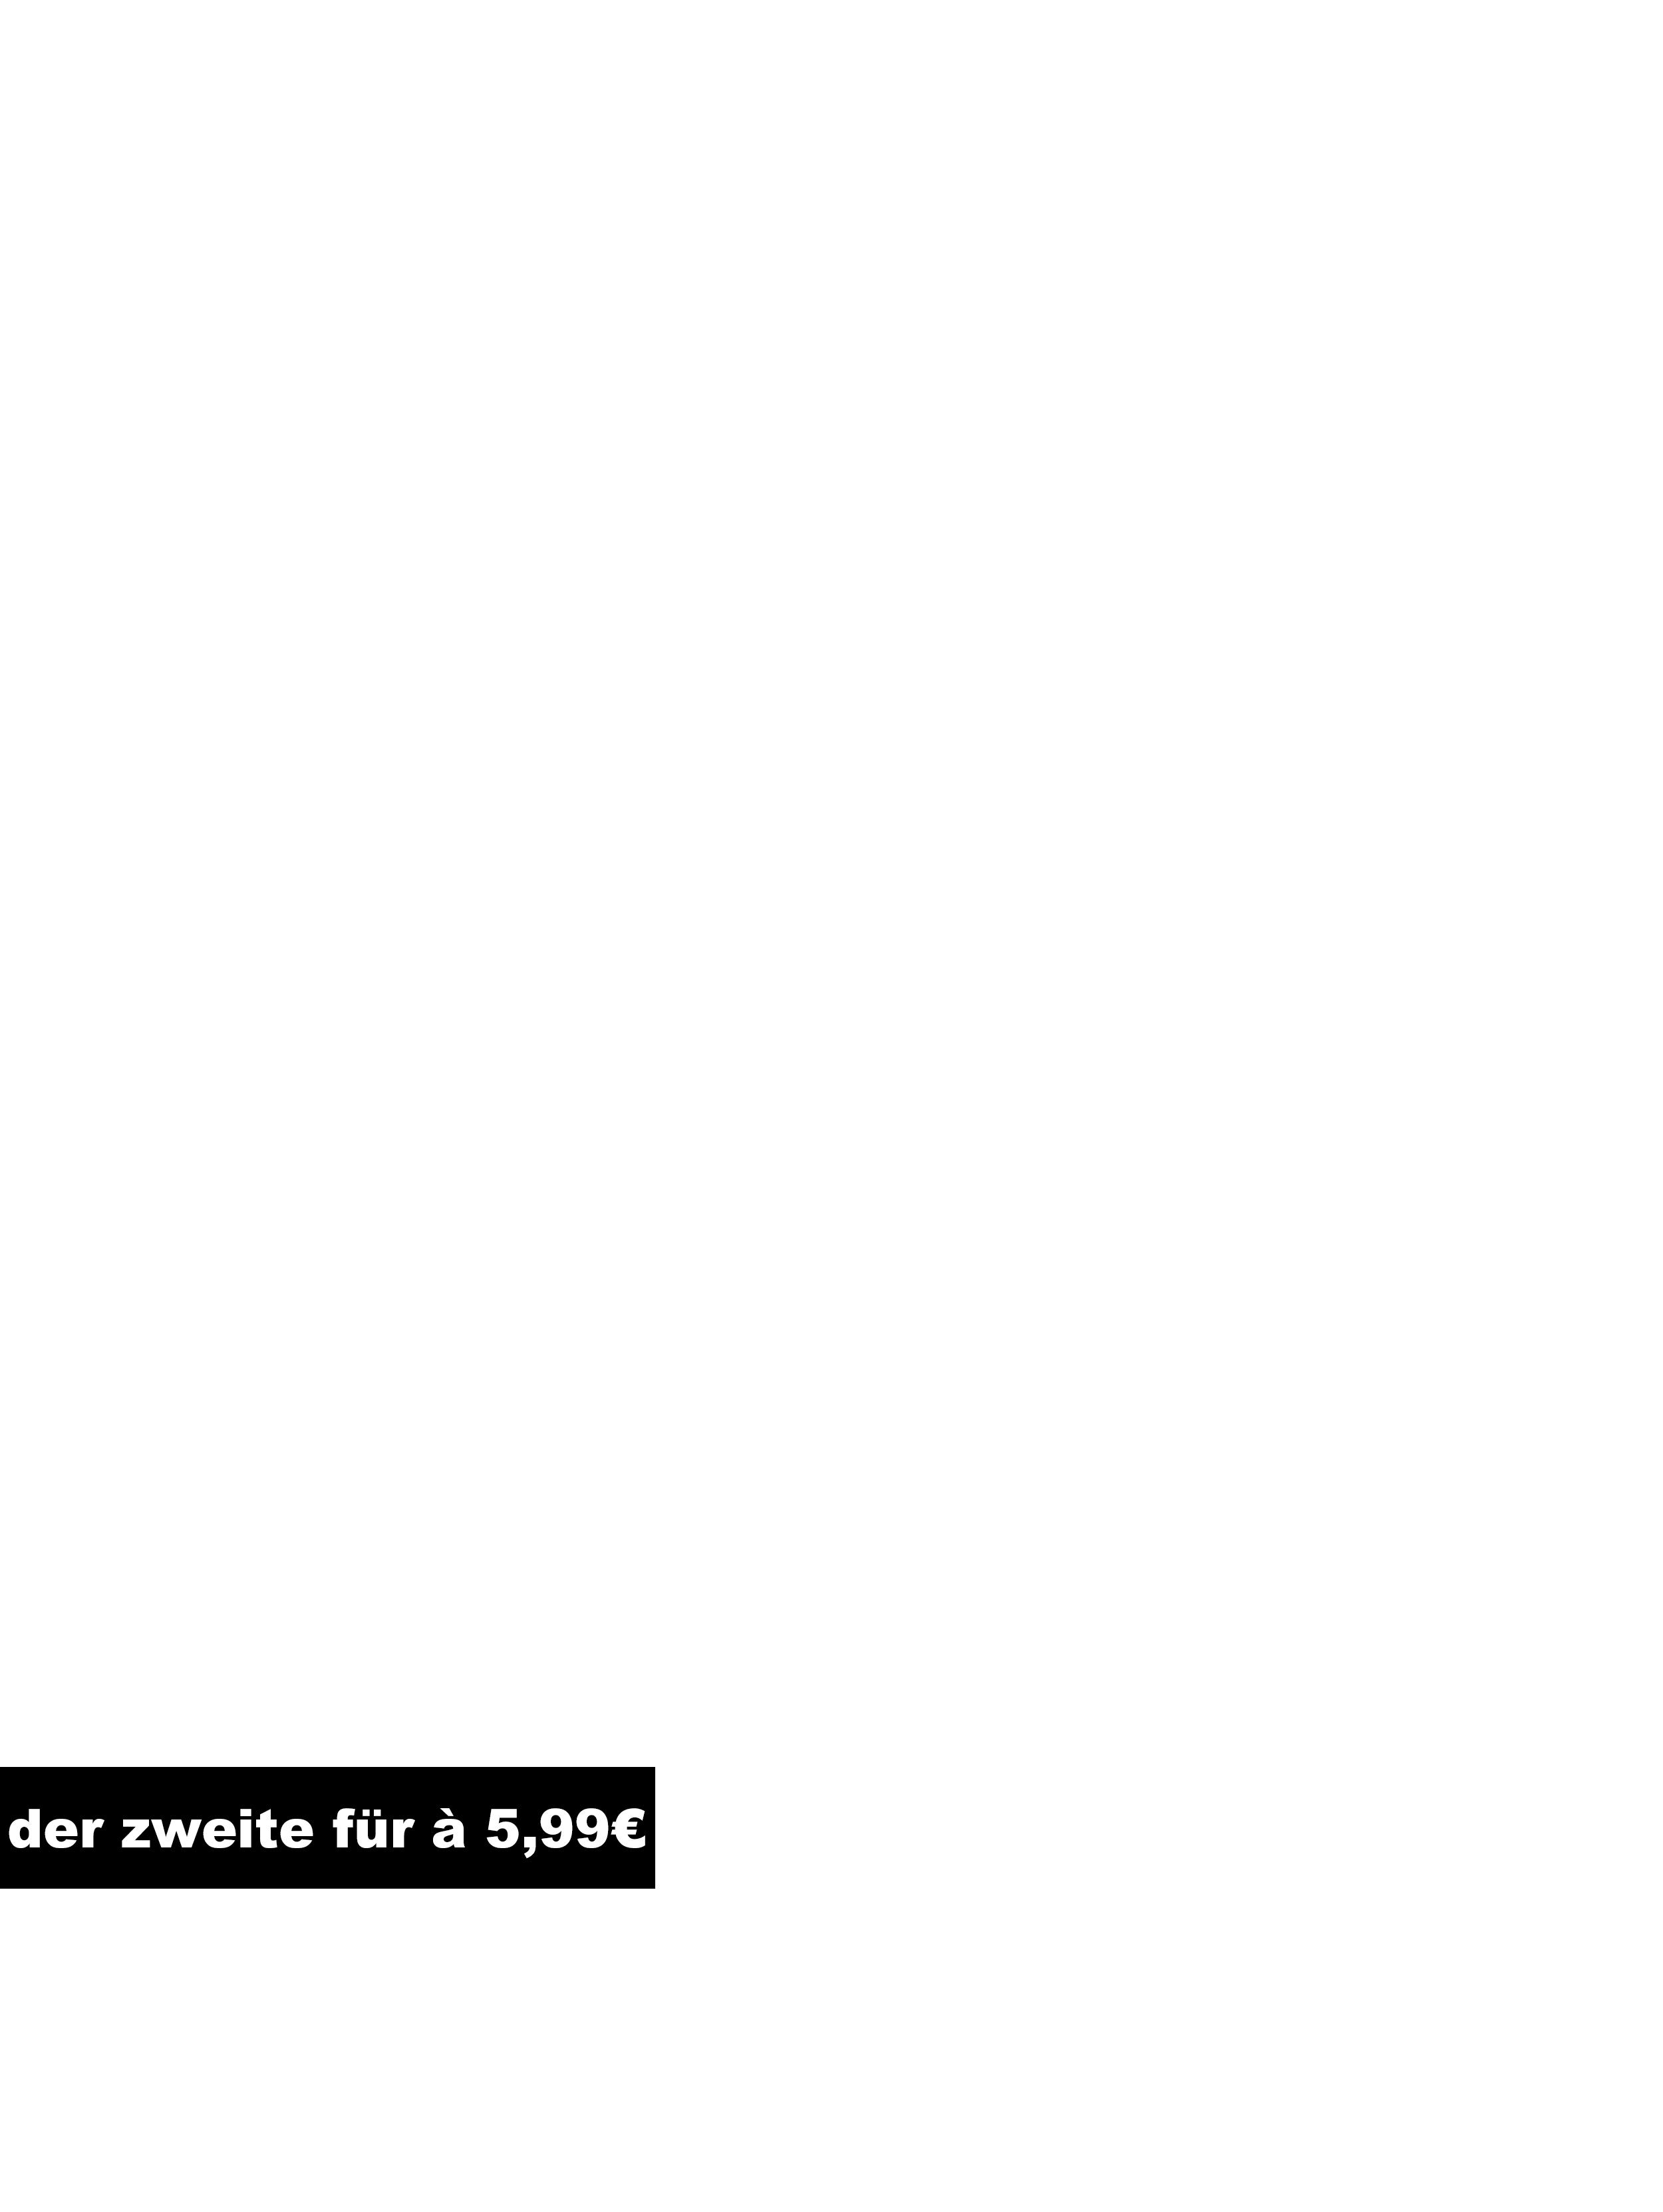 GER_ secondo a 5.99